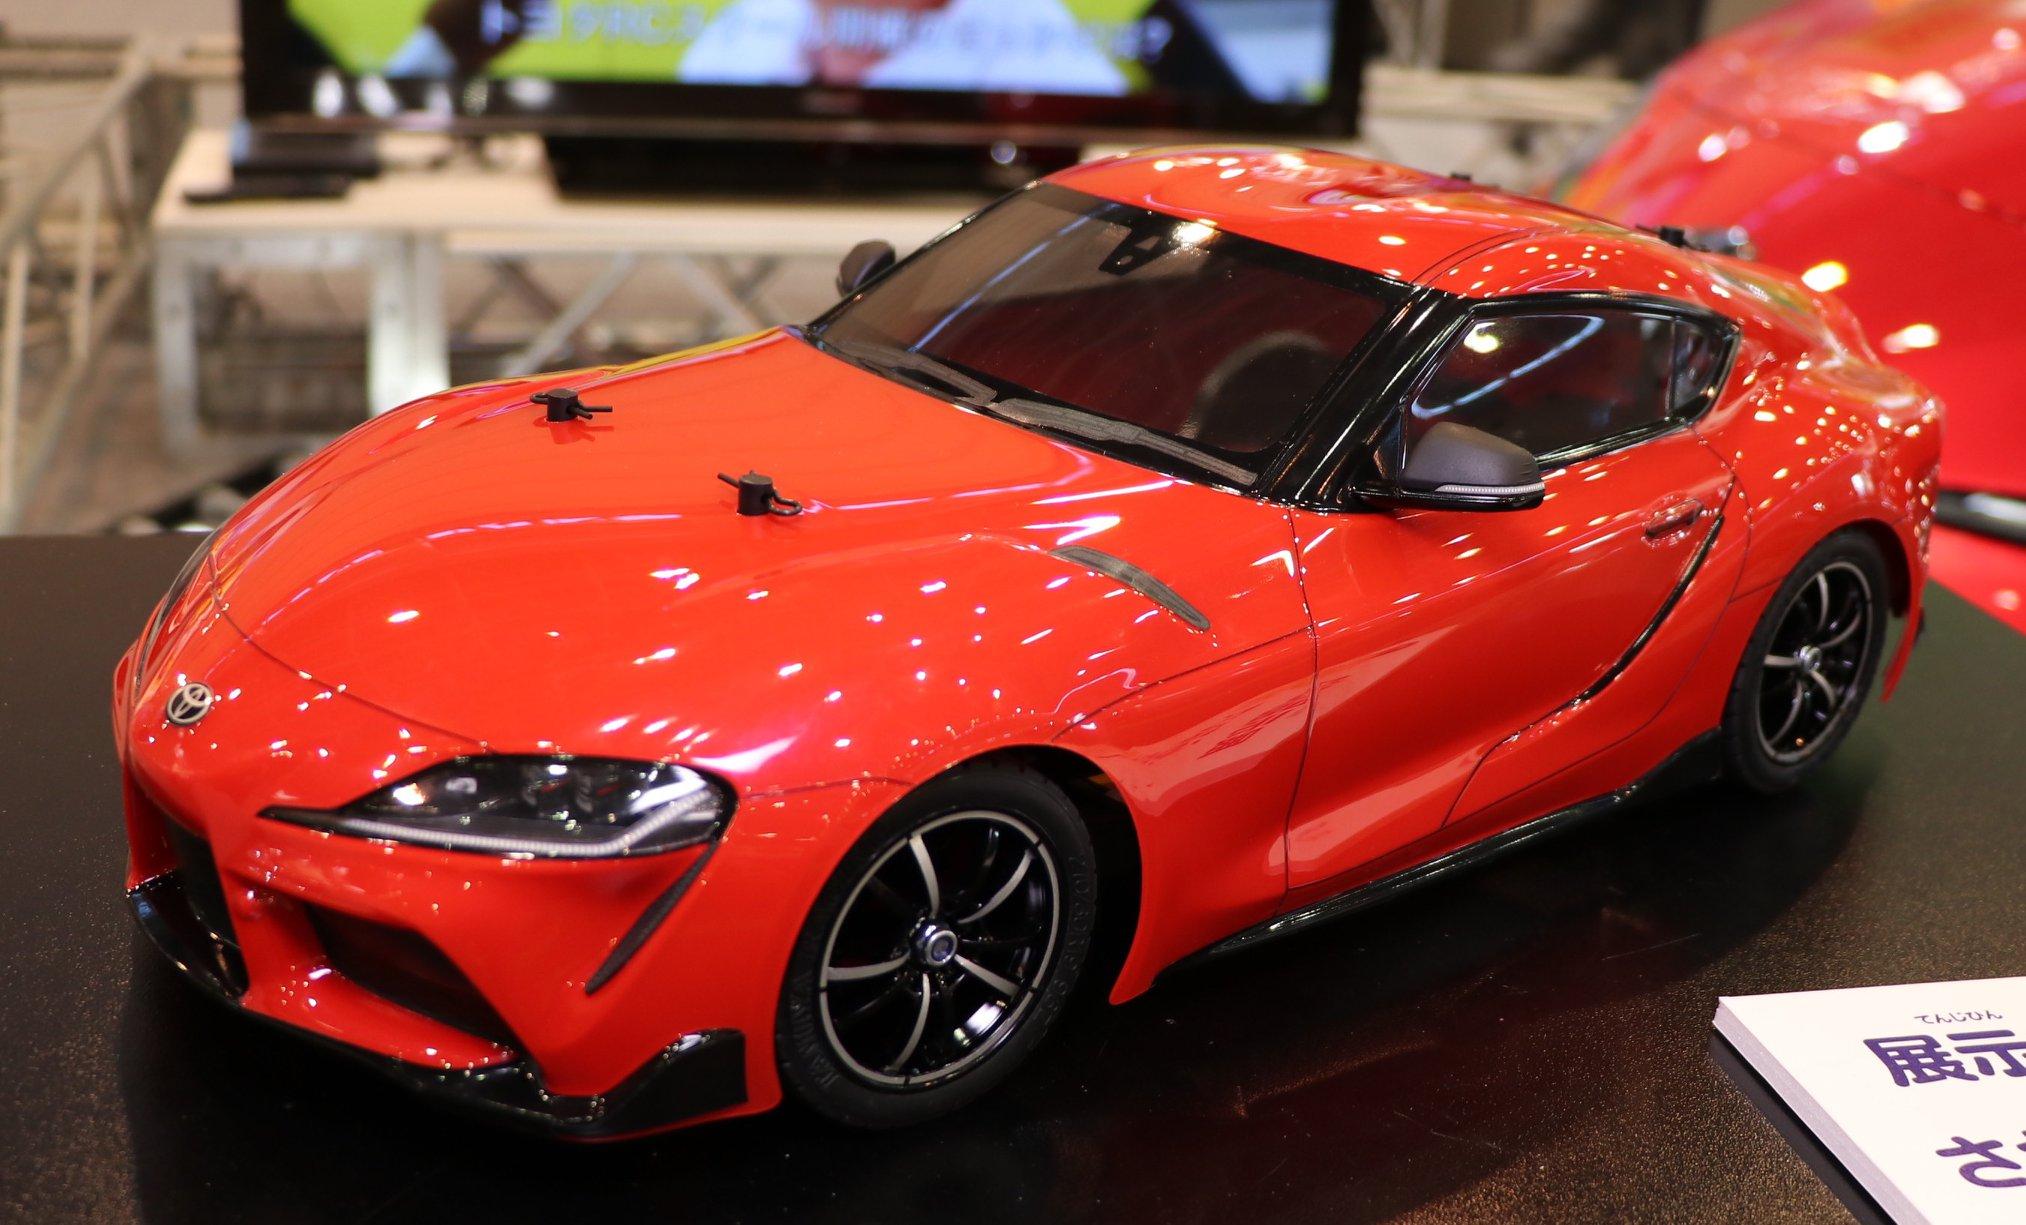 Shizuoka Hobby Show 2020.New Tamiya Rc Model Releases Shown At The 58th Shizuoka